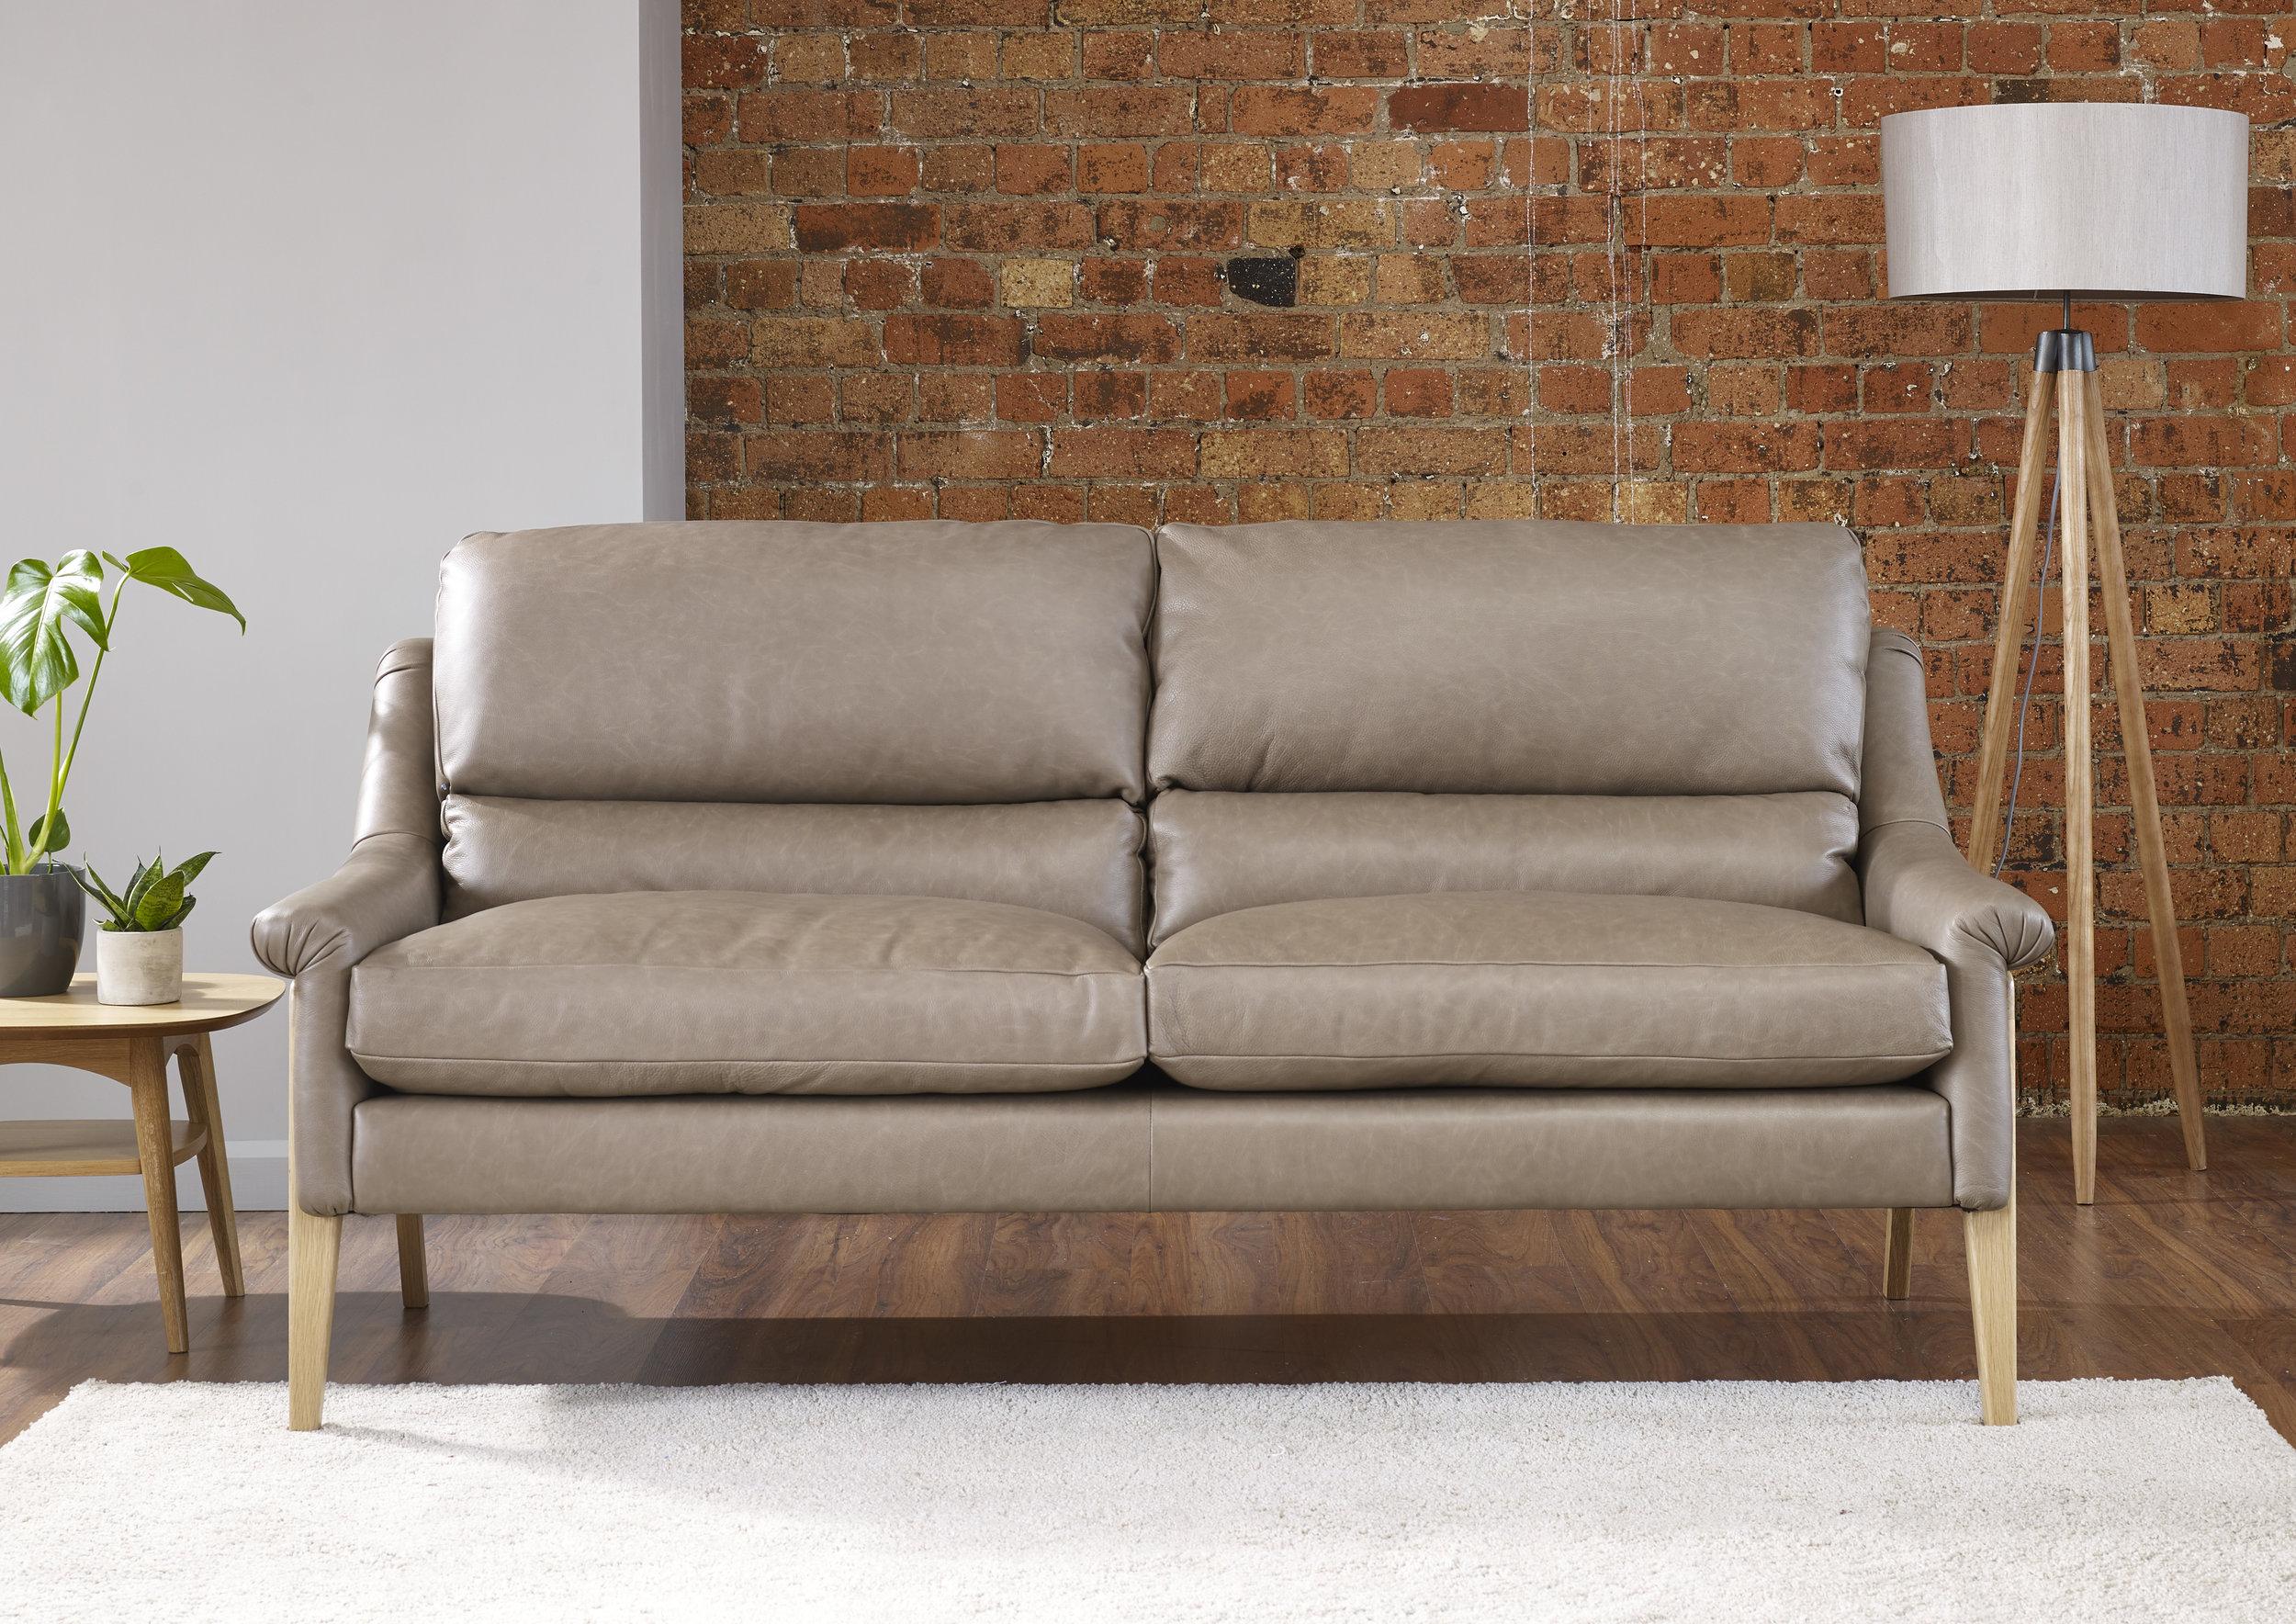 Scarlett Large sofa.jpg